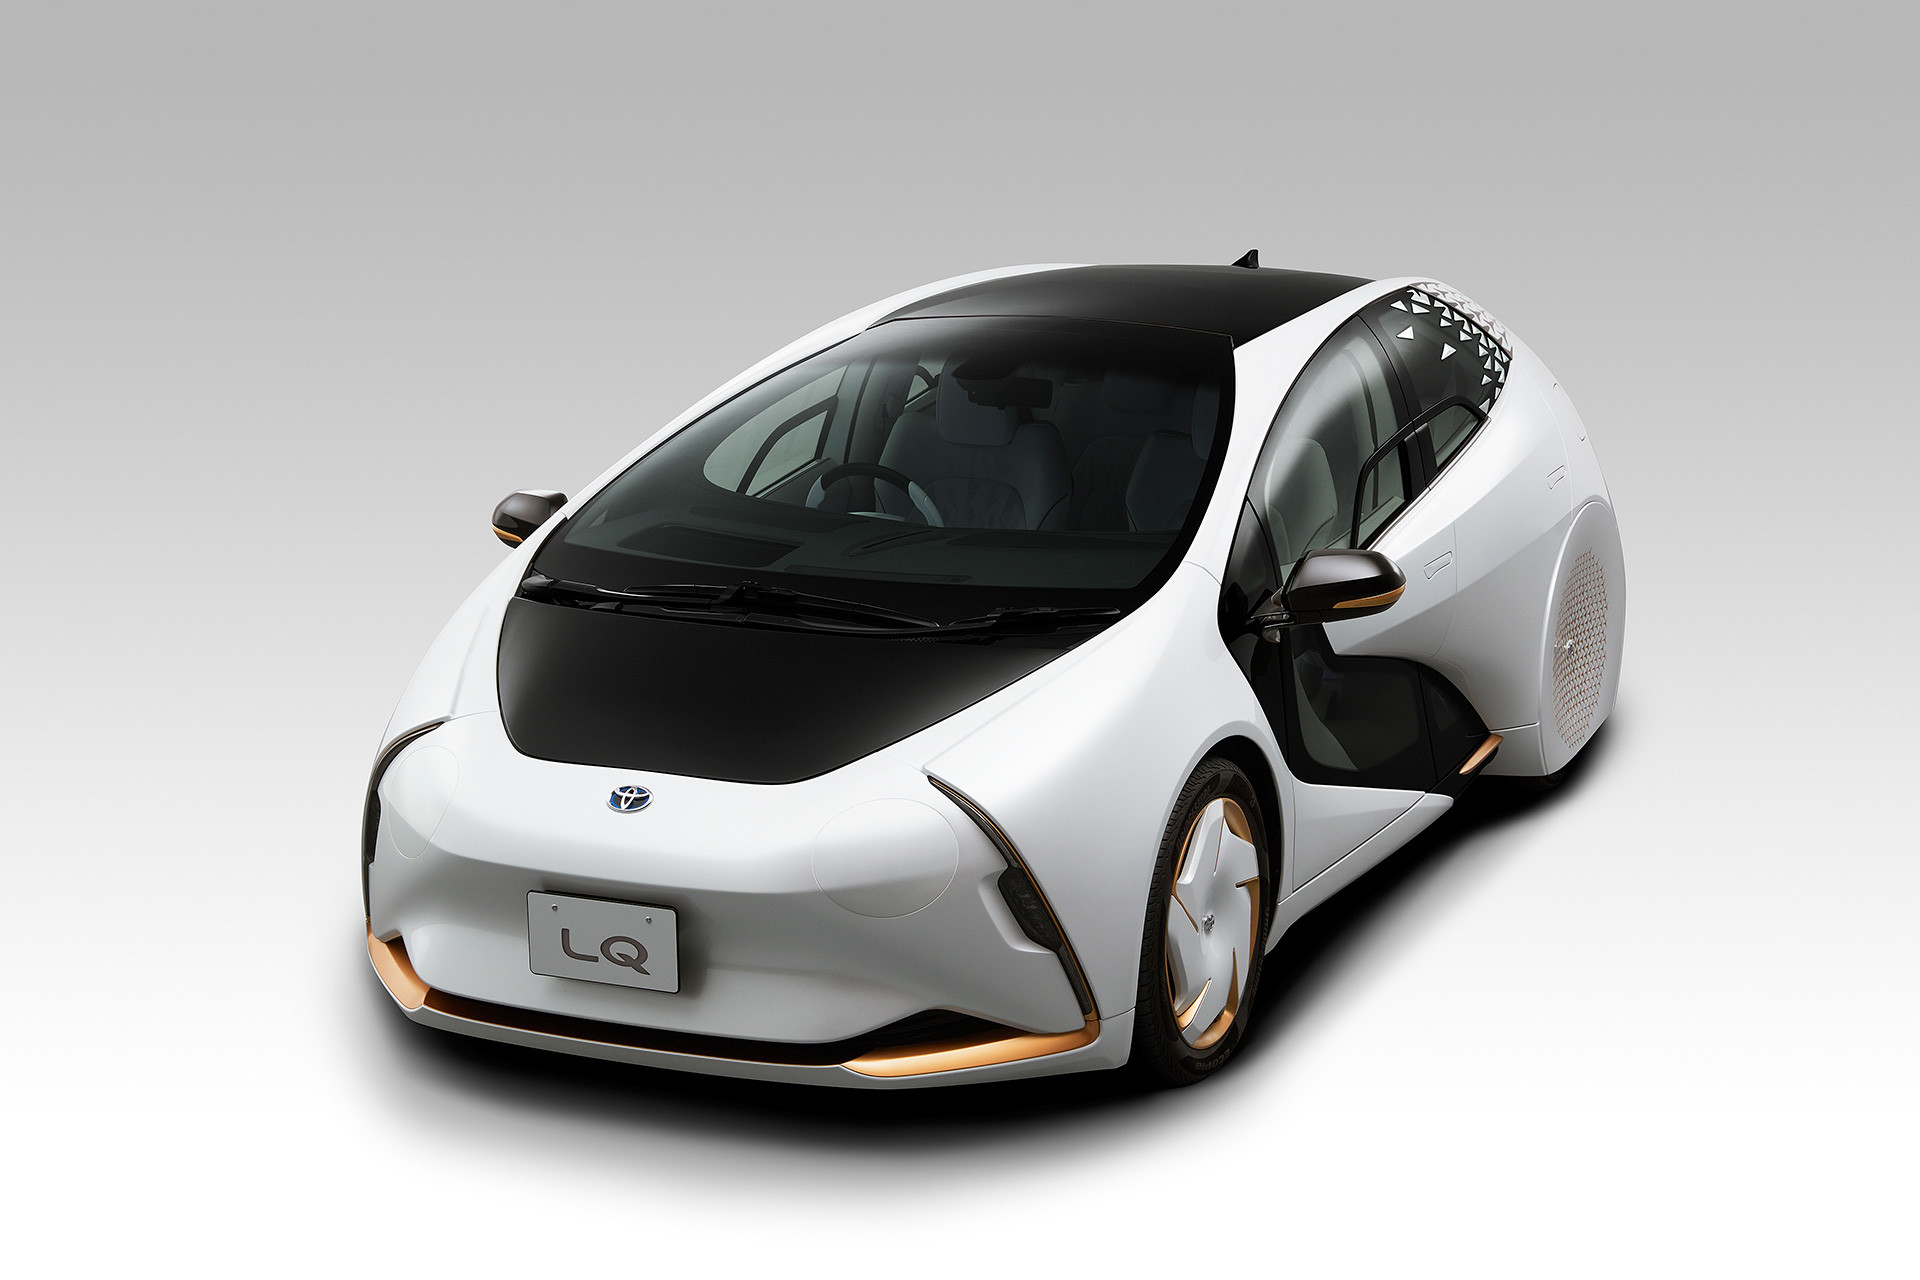 Foto de Toyota LQ Concept (1/8)